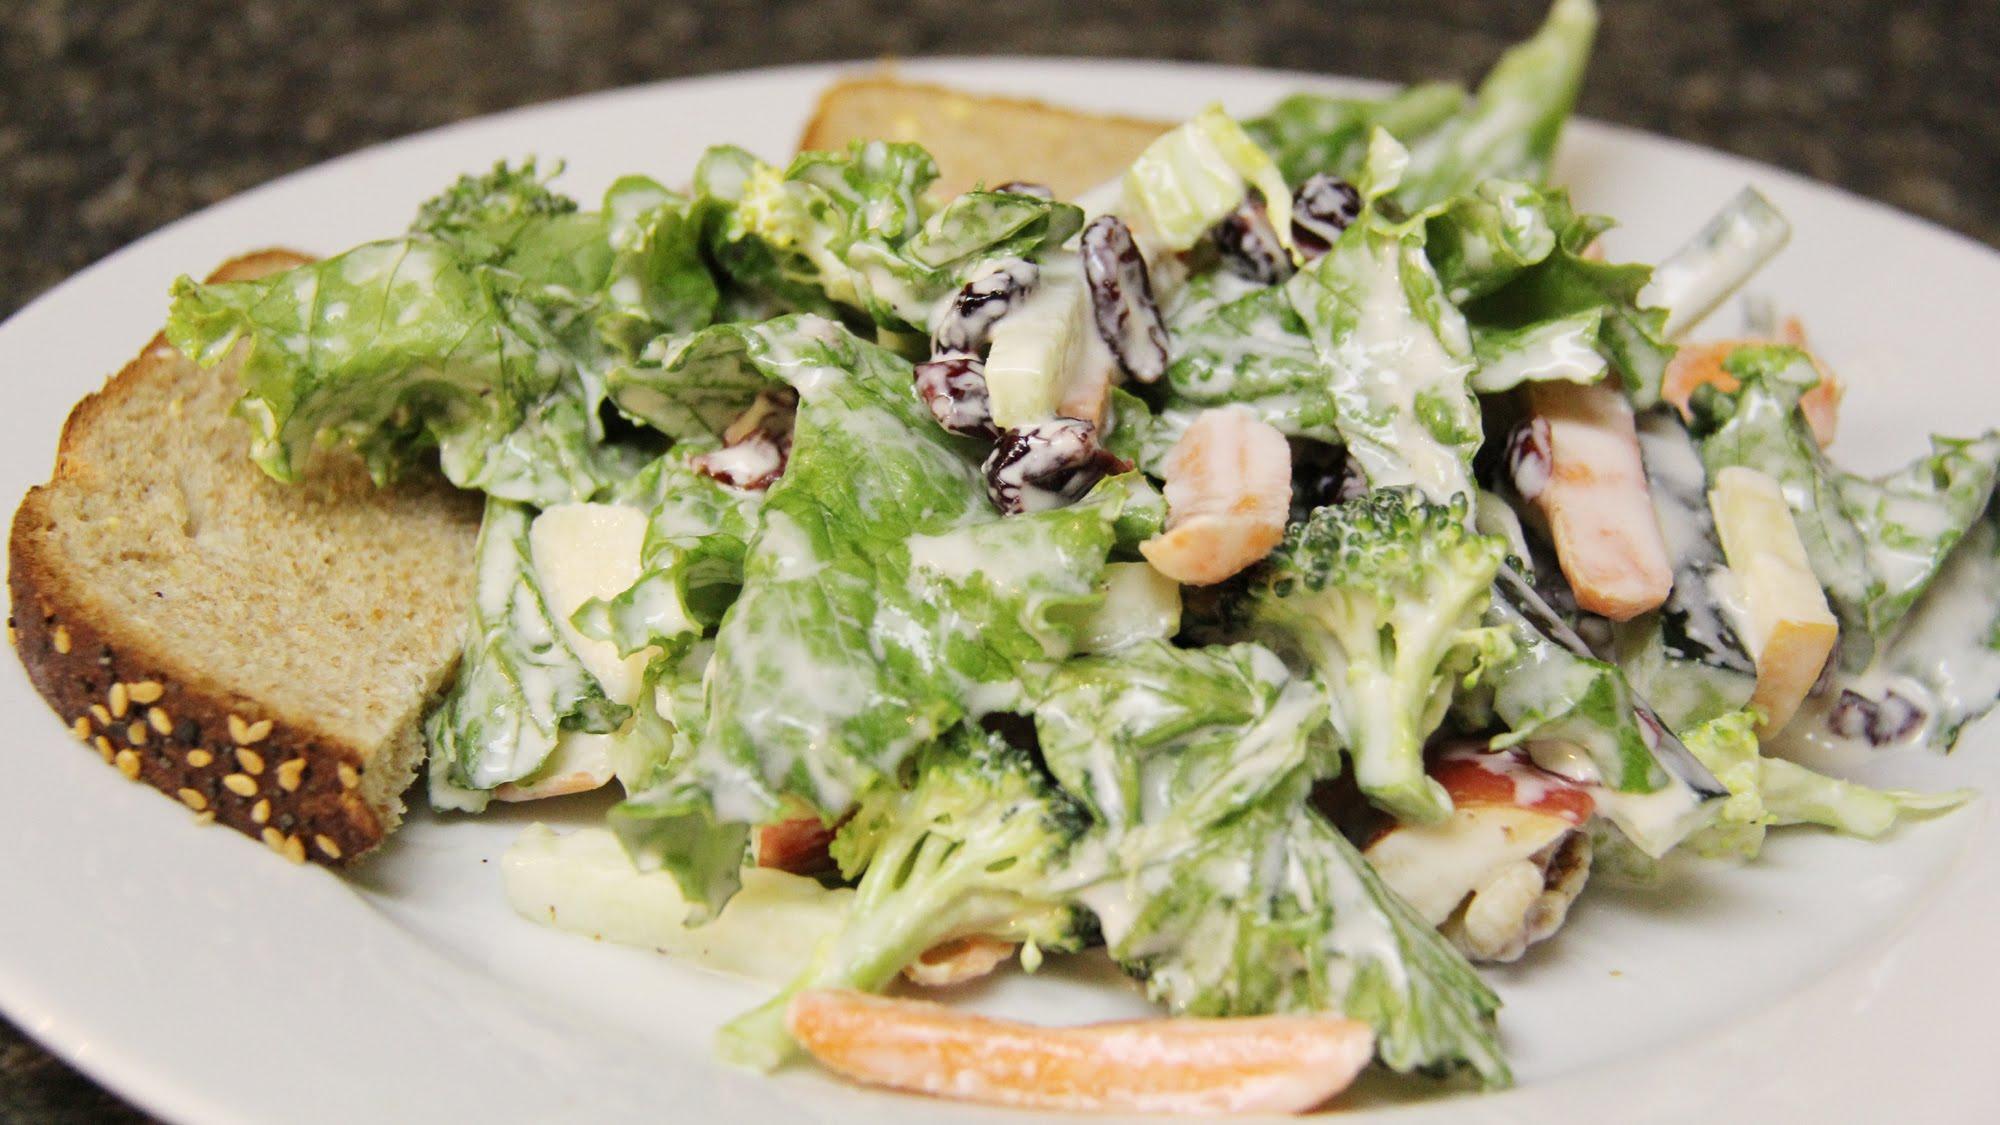 Making veg salad photo